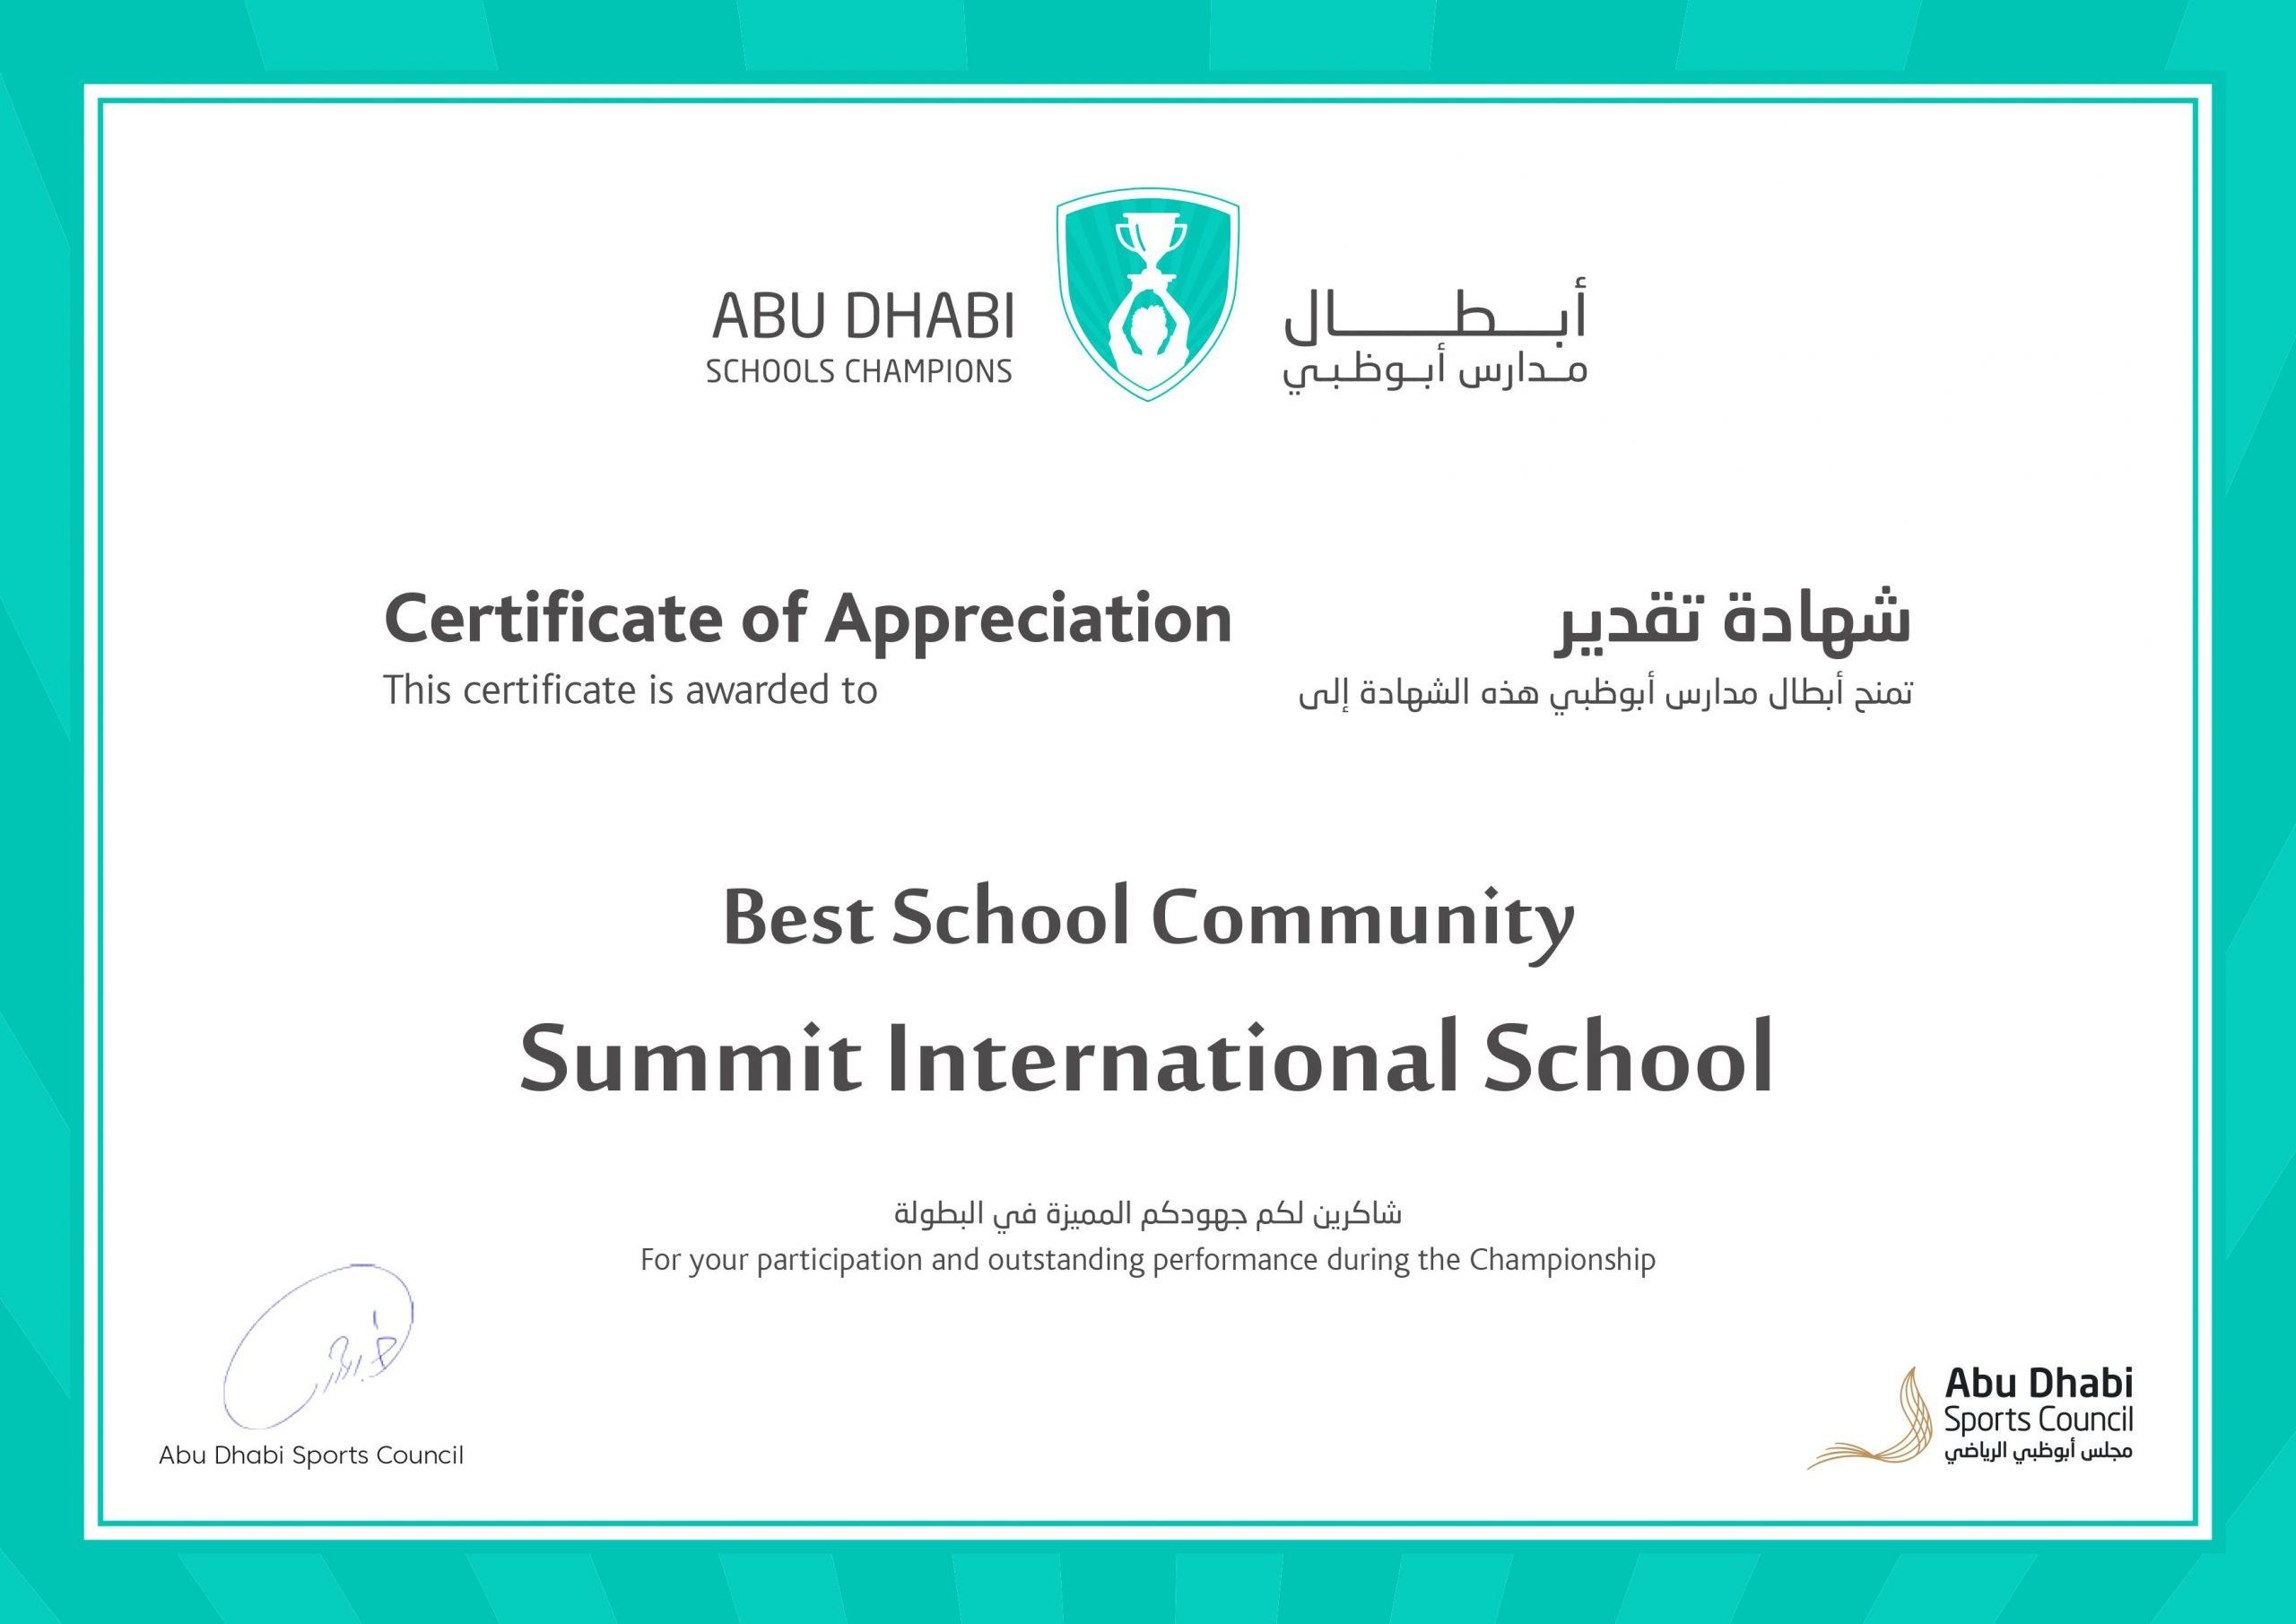 Best School Community